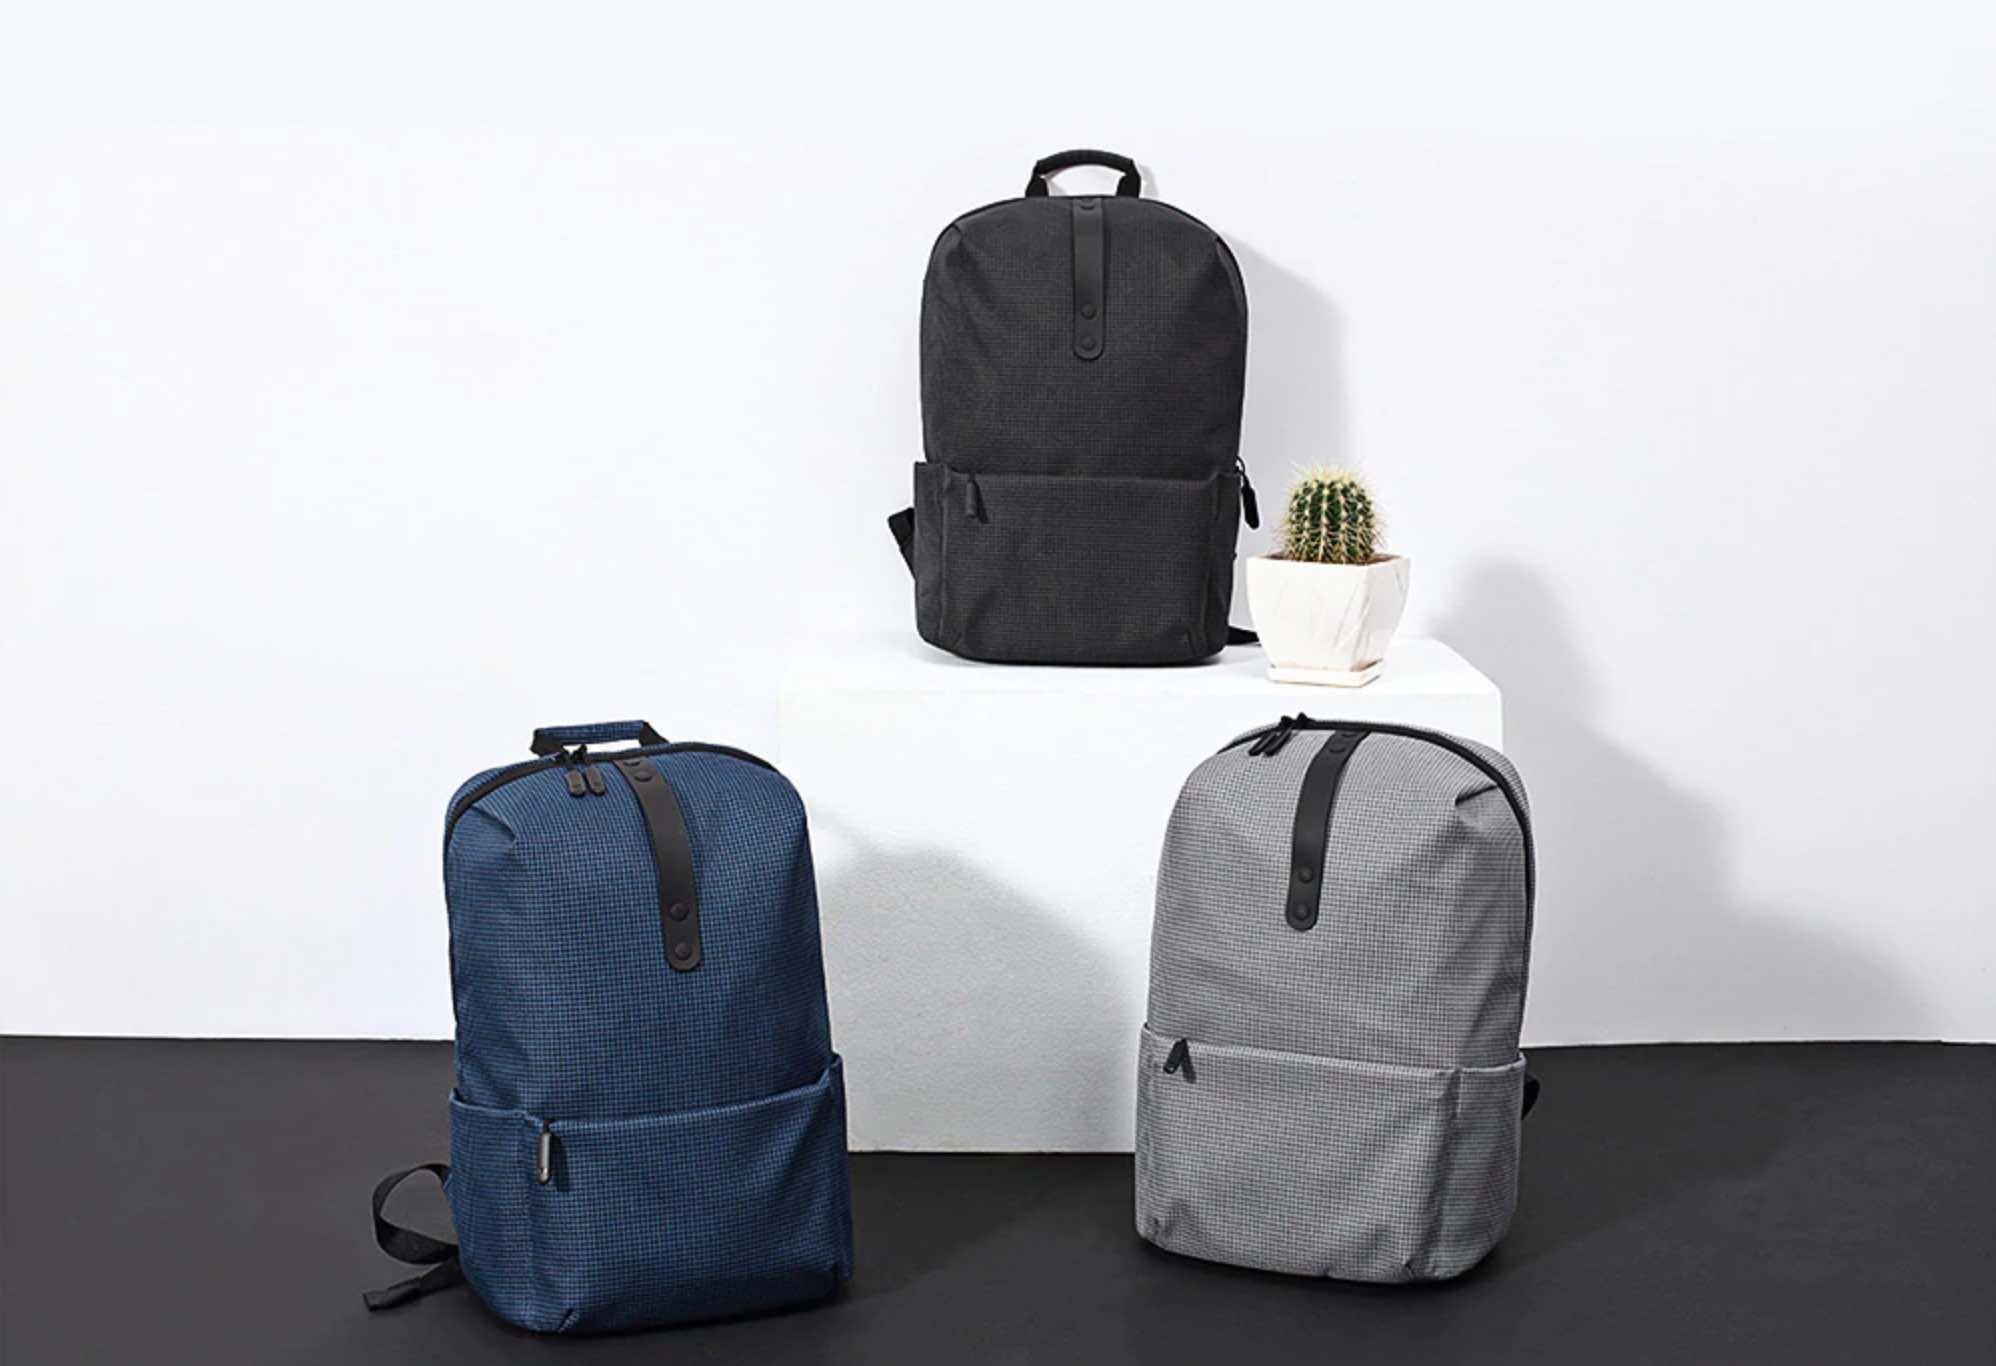 GearBest: Xiaomi 20L Leisure Backpack